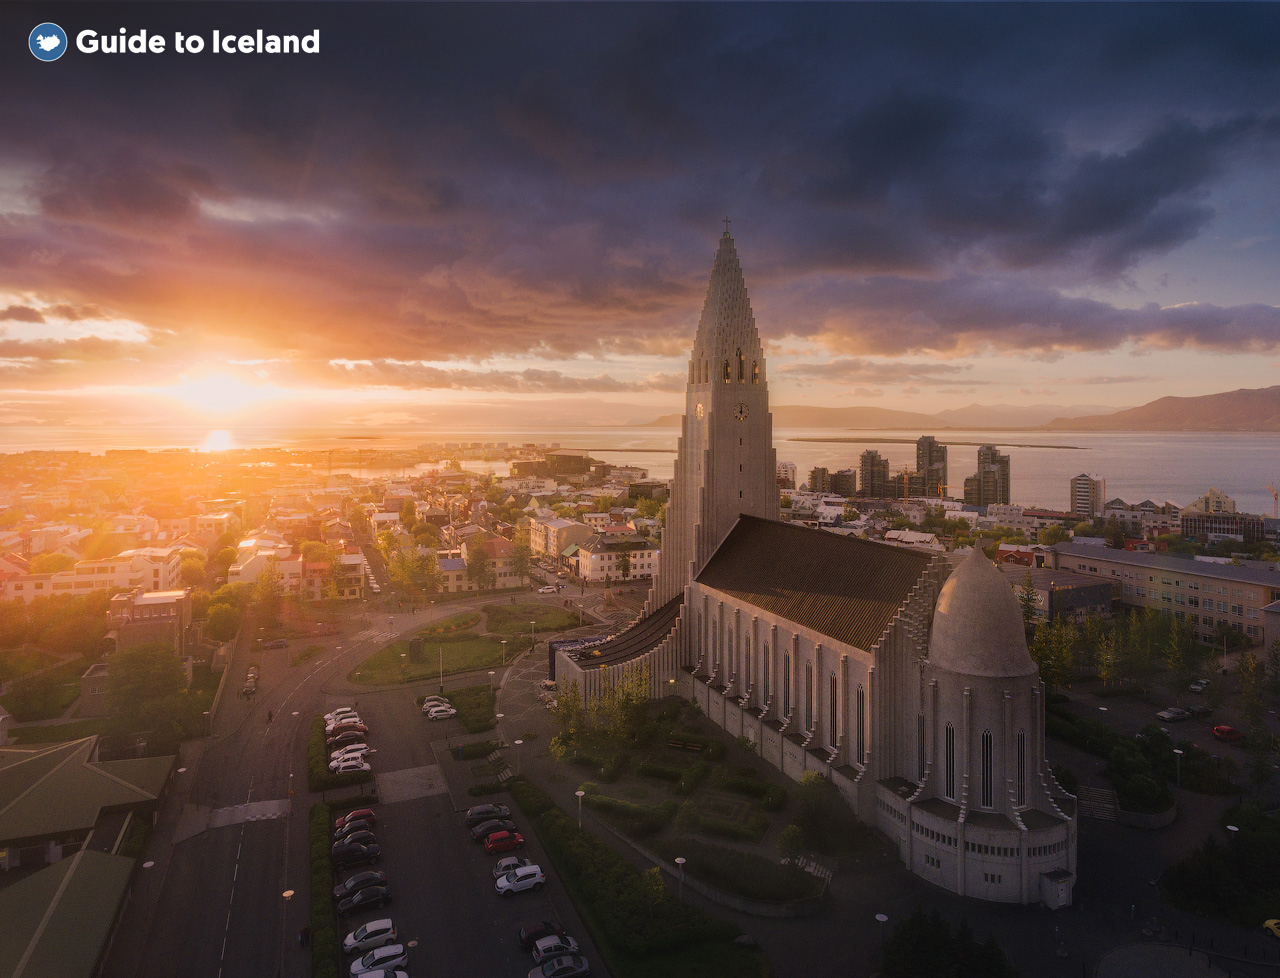 Hallgrímskirkjain downtown Reykjavik, pictured at sunset.